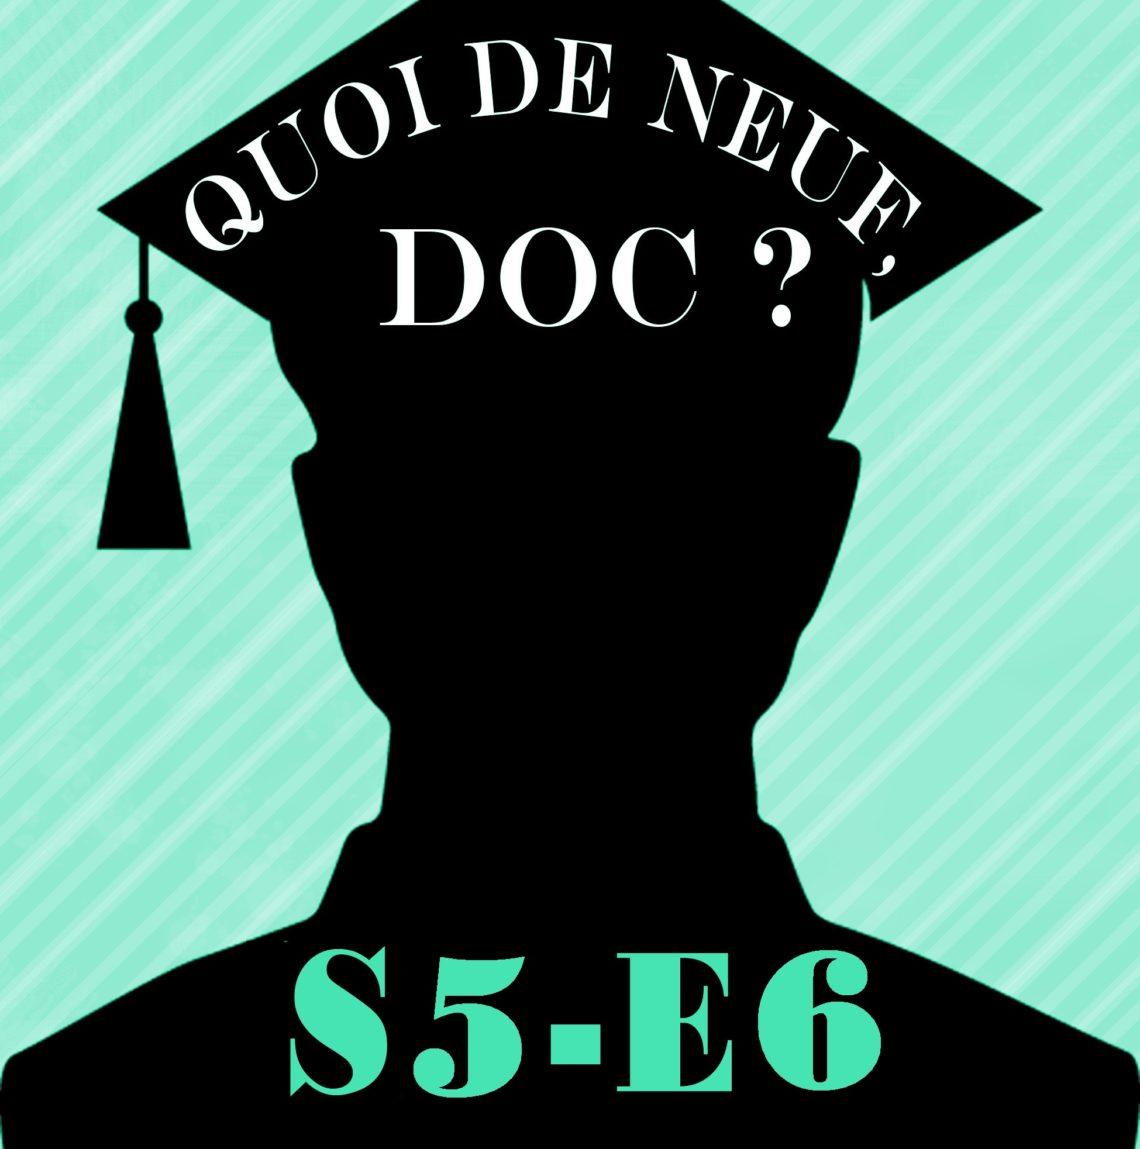 QDND S5E6 du mercredi 13 mars 2019